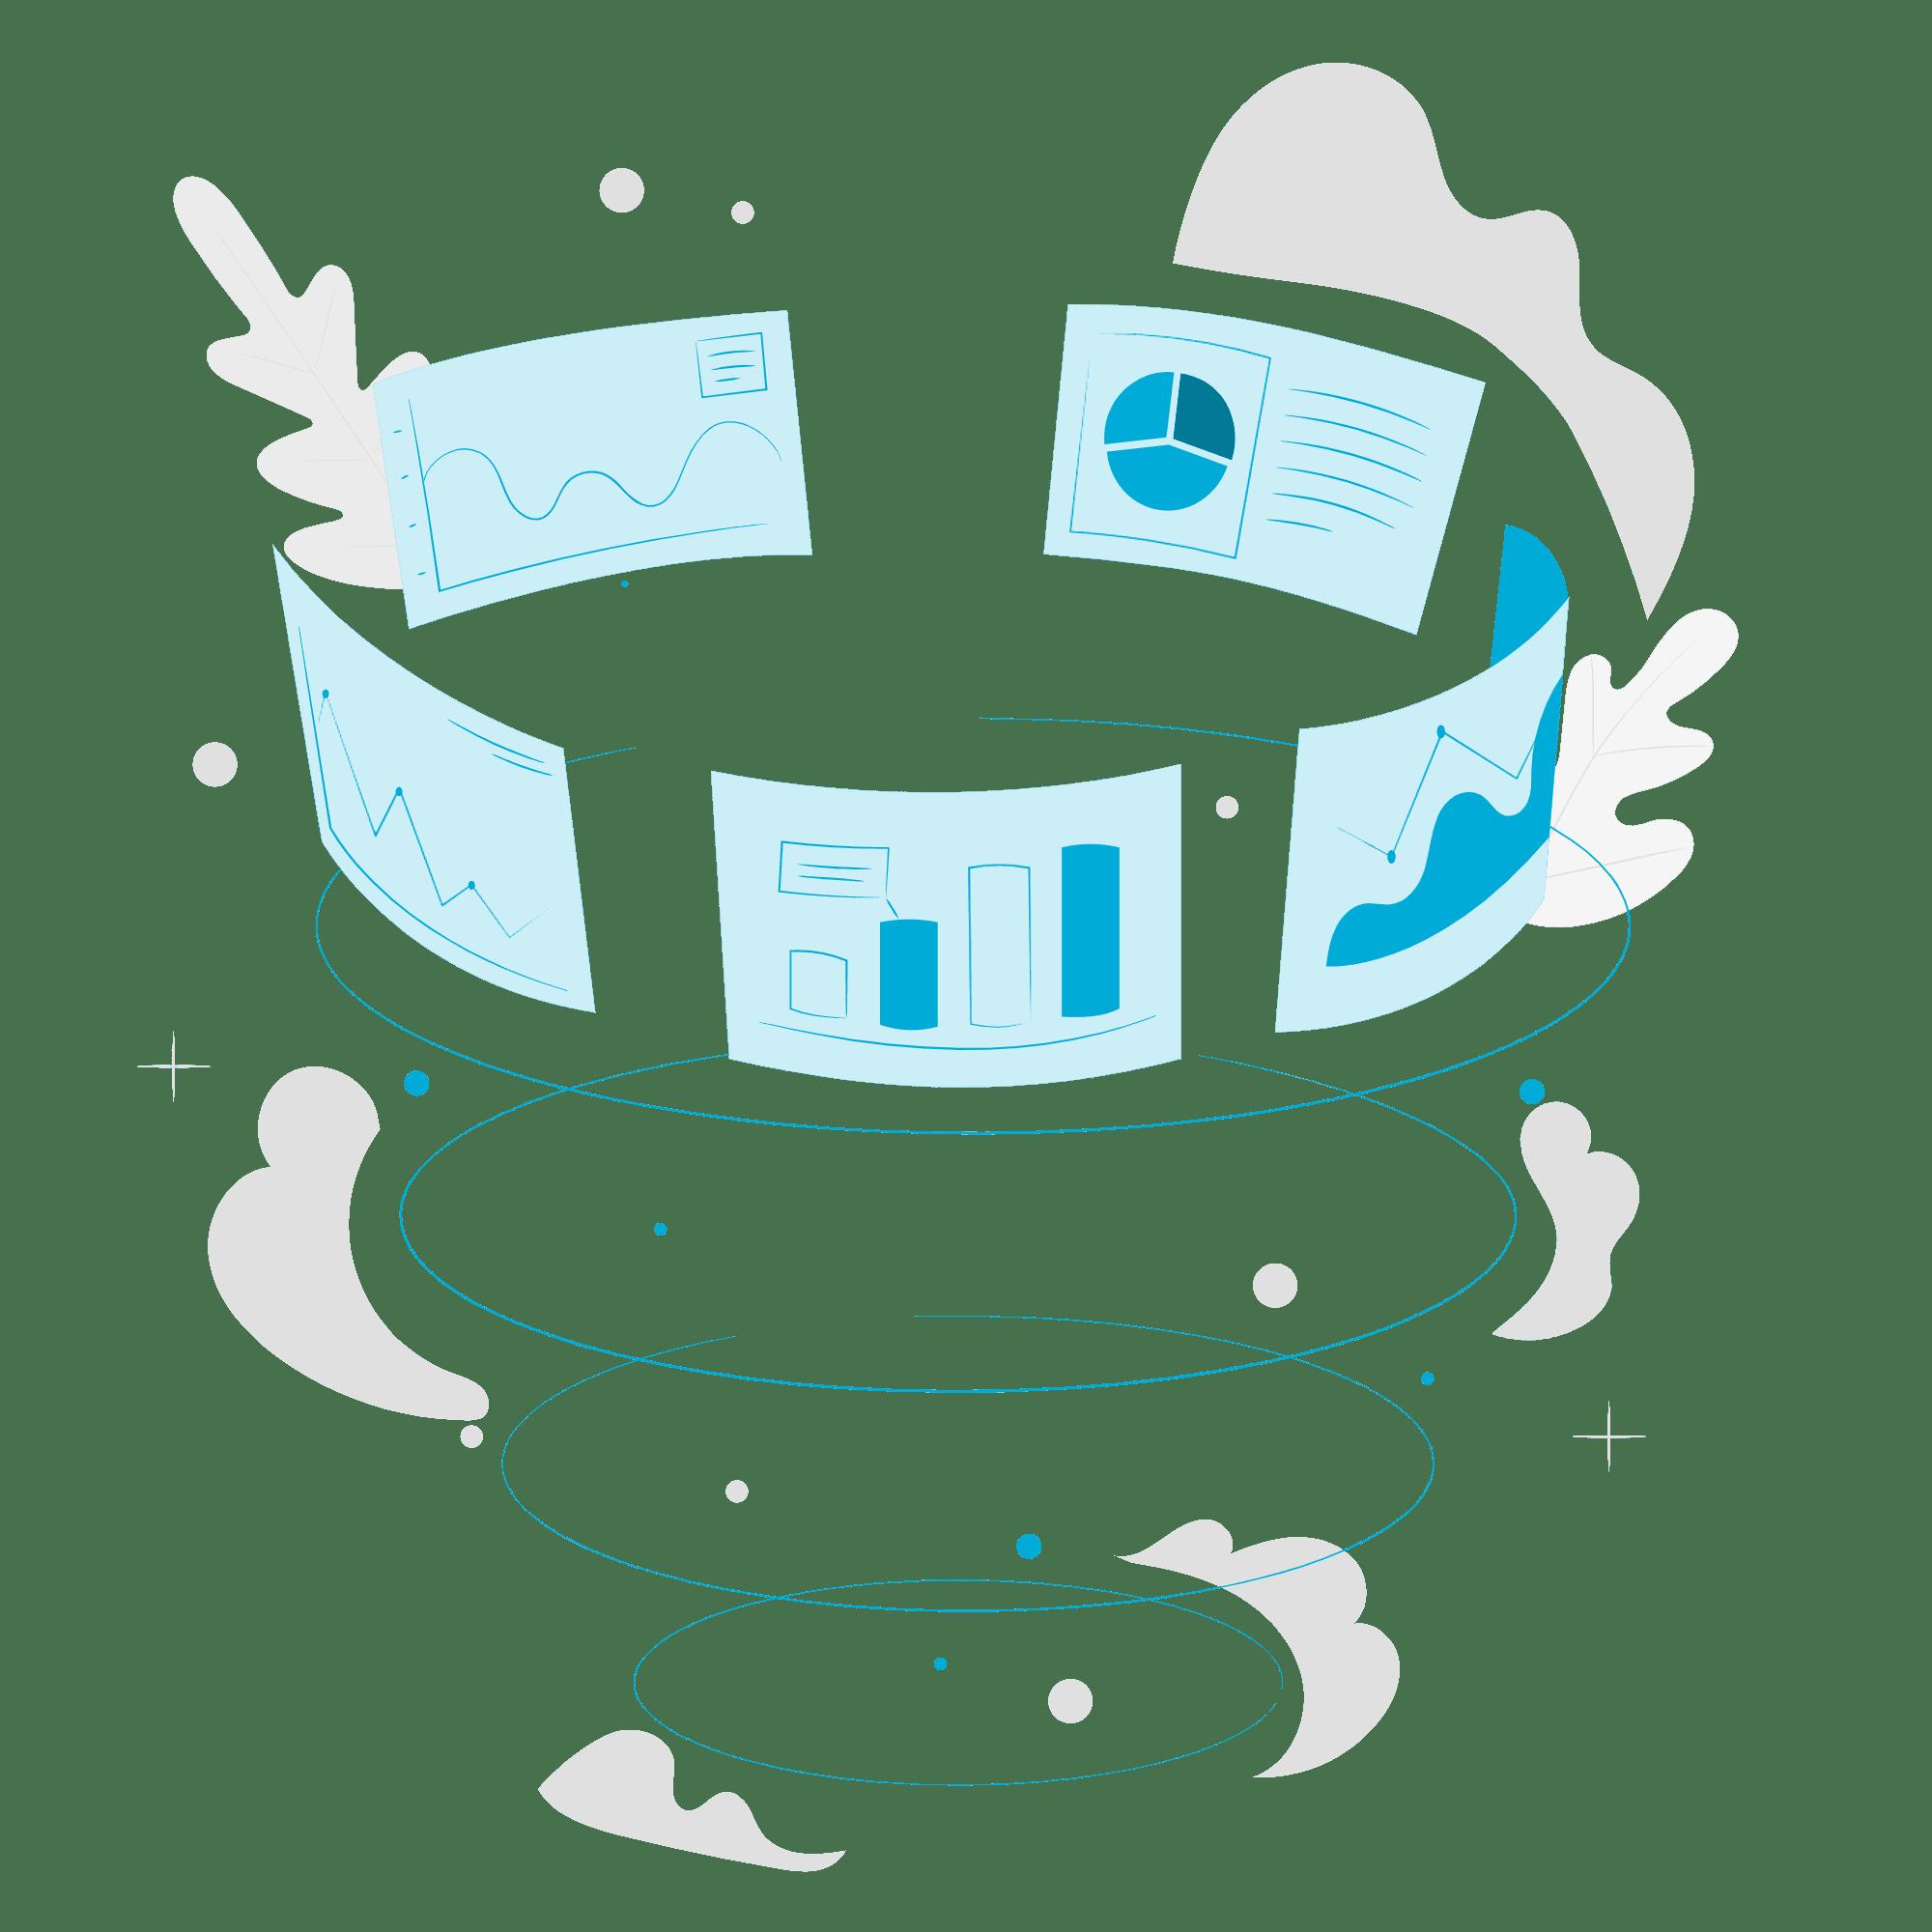 "<a href=""https://storyset.com/data"">Illustration by Freepik Storyset</a>"